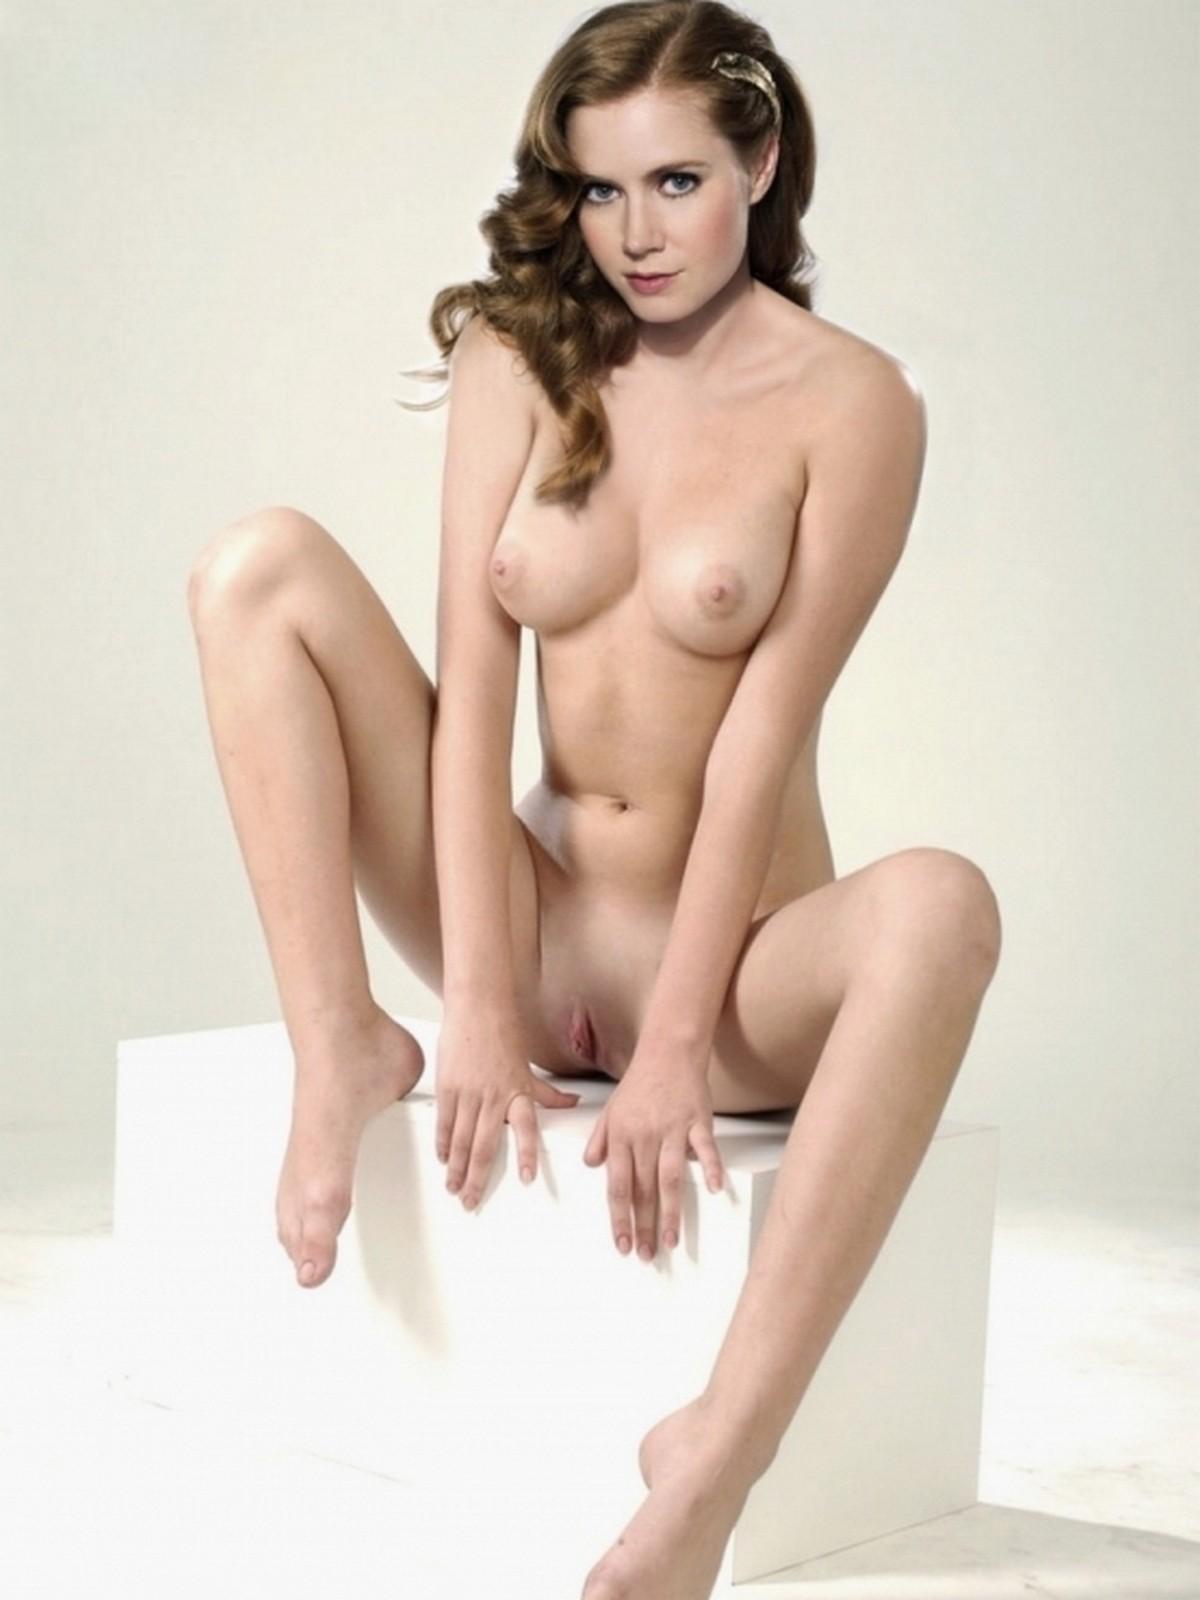 Amy shirley hot pics naked pics boobs